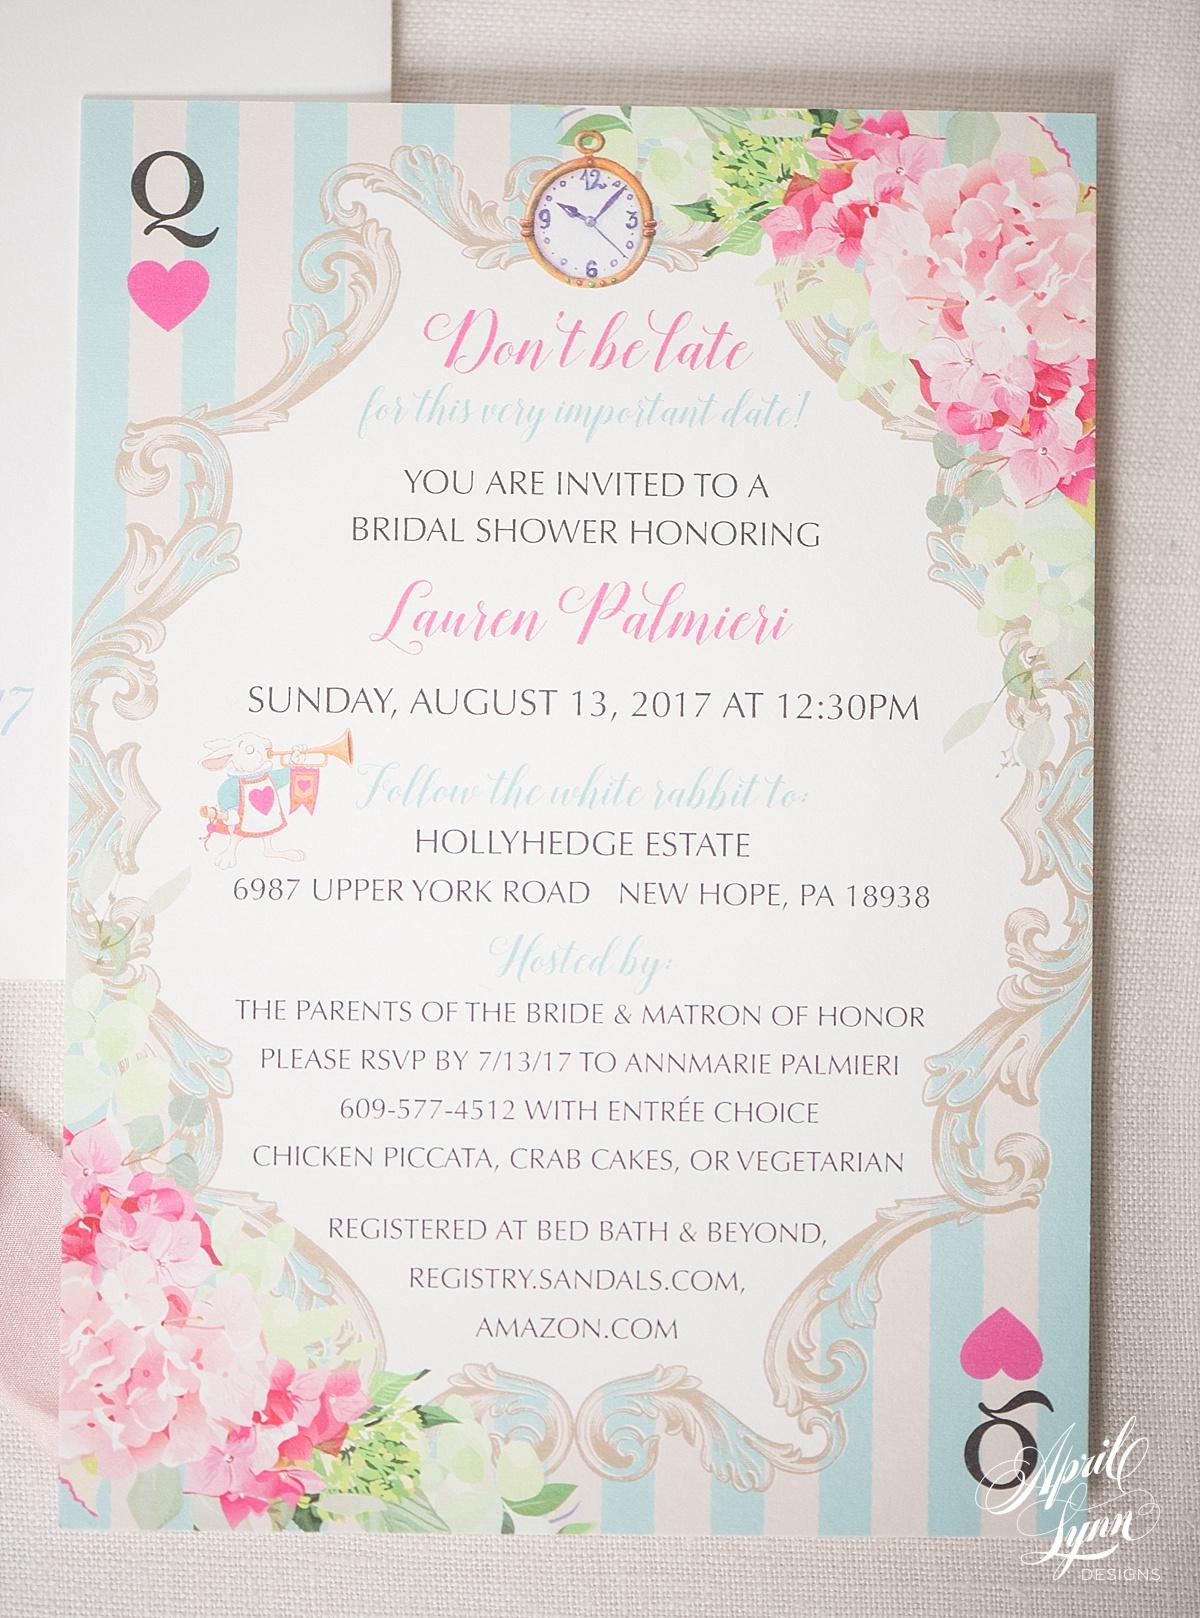 Wonderland Themed Bridal Shower Invitation   www.aprillynndesigns.com